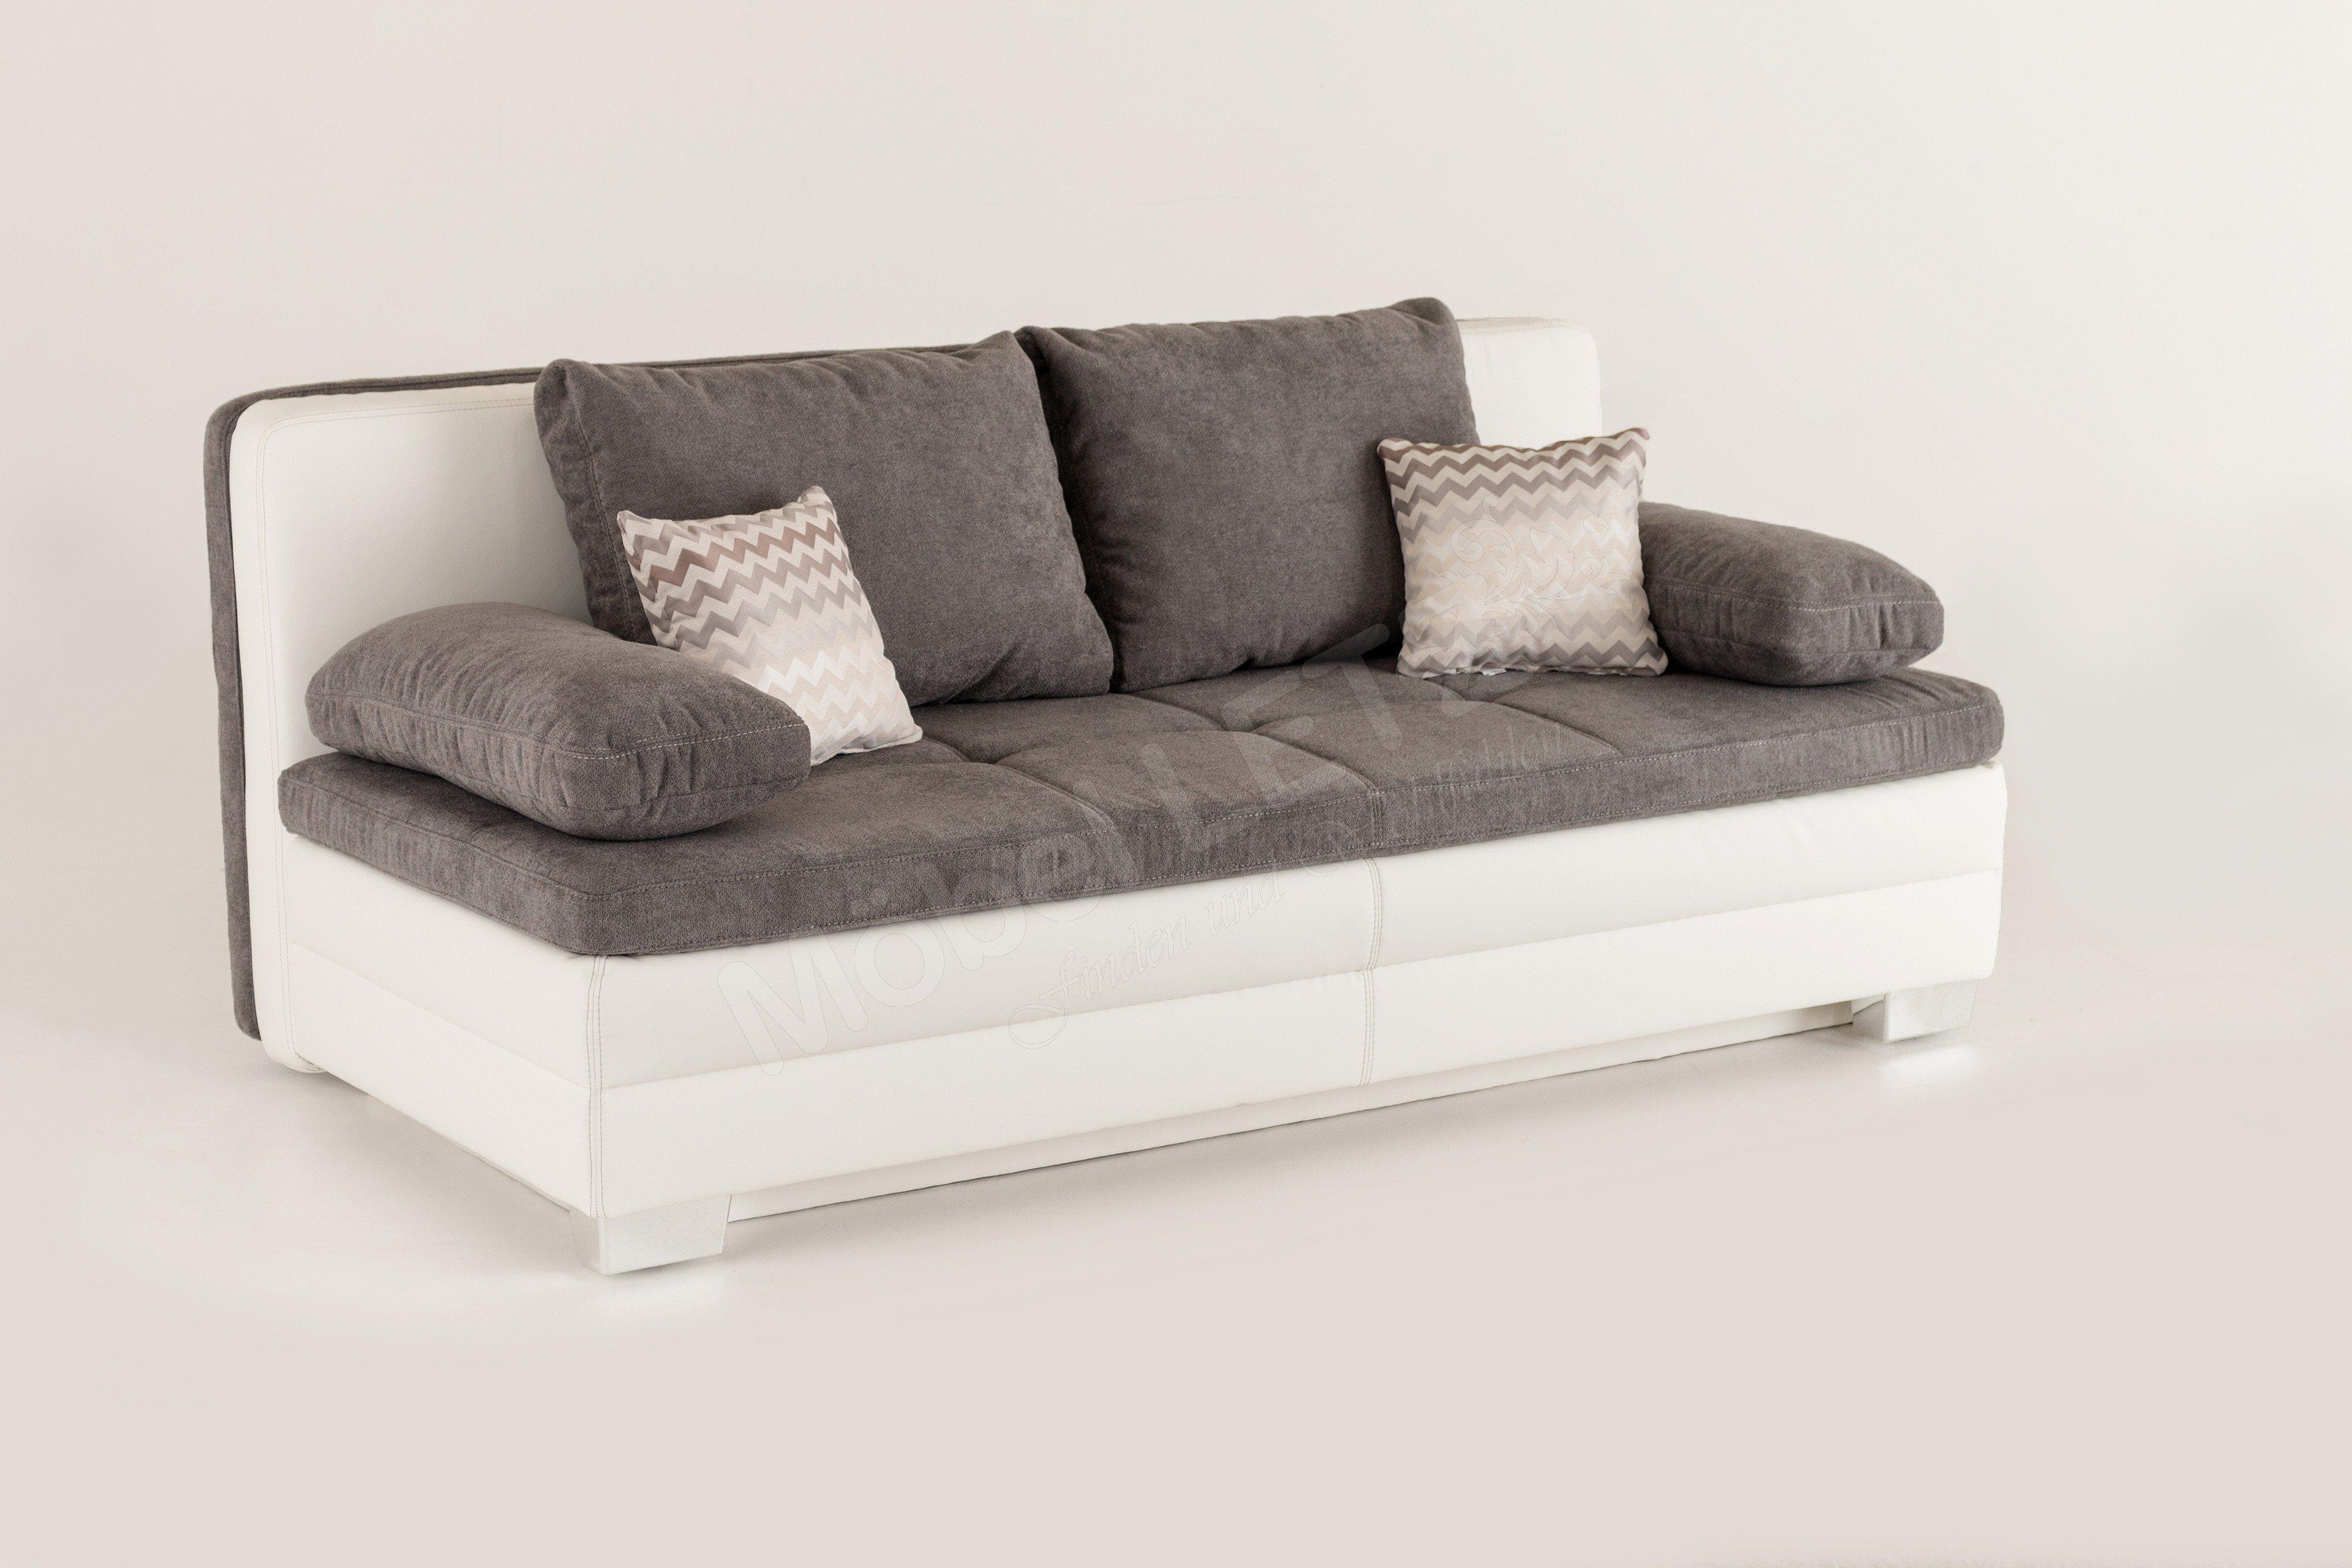 jockenh fer lincoln sabrina schlafsofa in grau wei. Black Bedroom Furniture Sets. Home Design Ideas